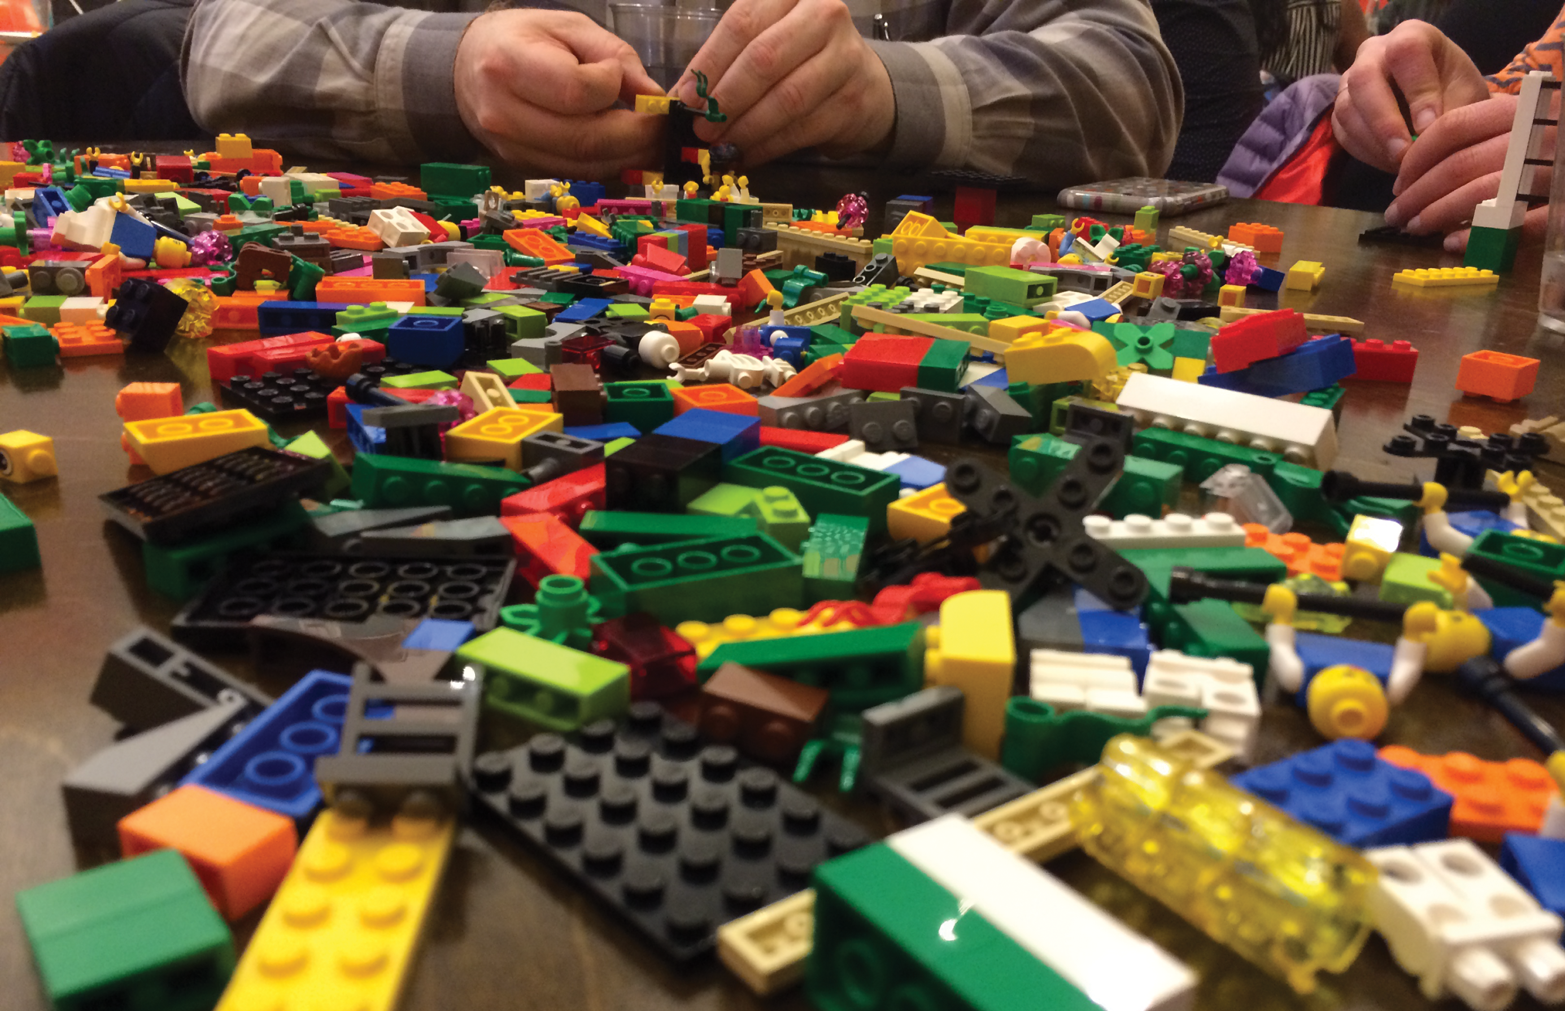 Happy Lego brick colors